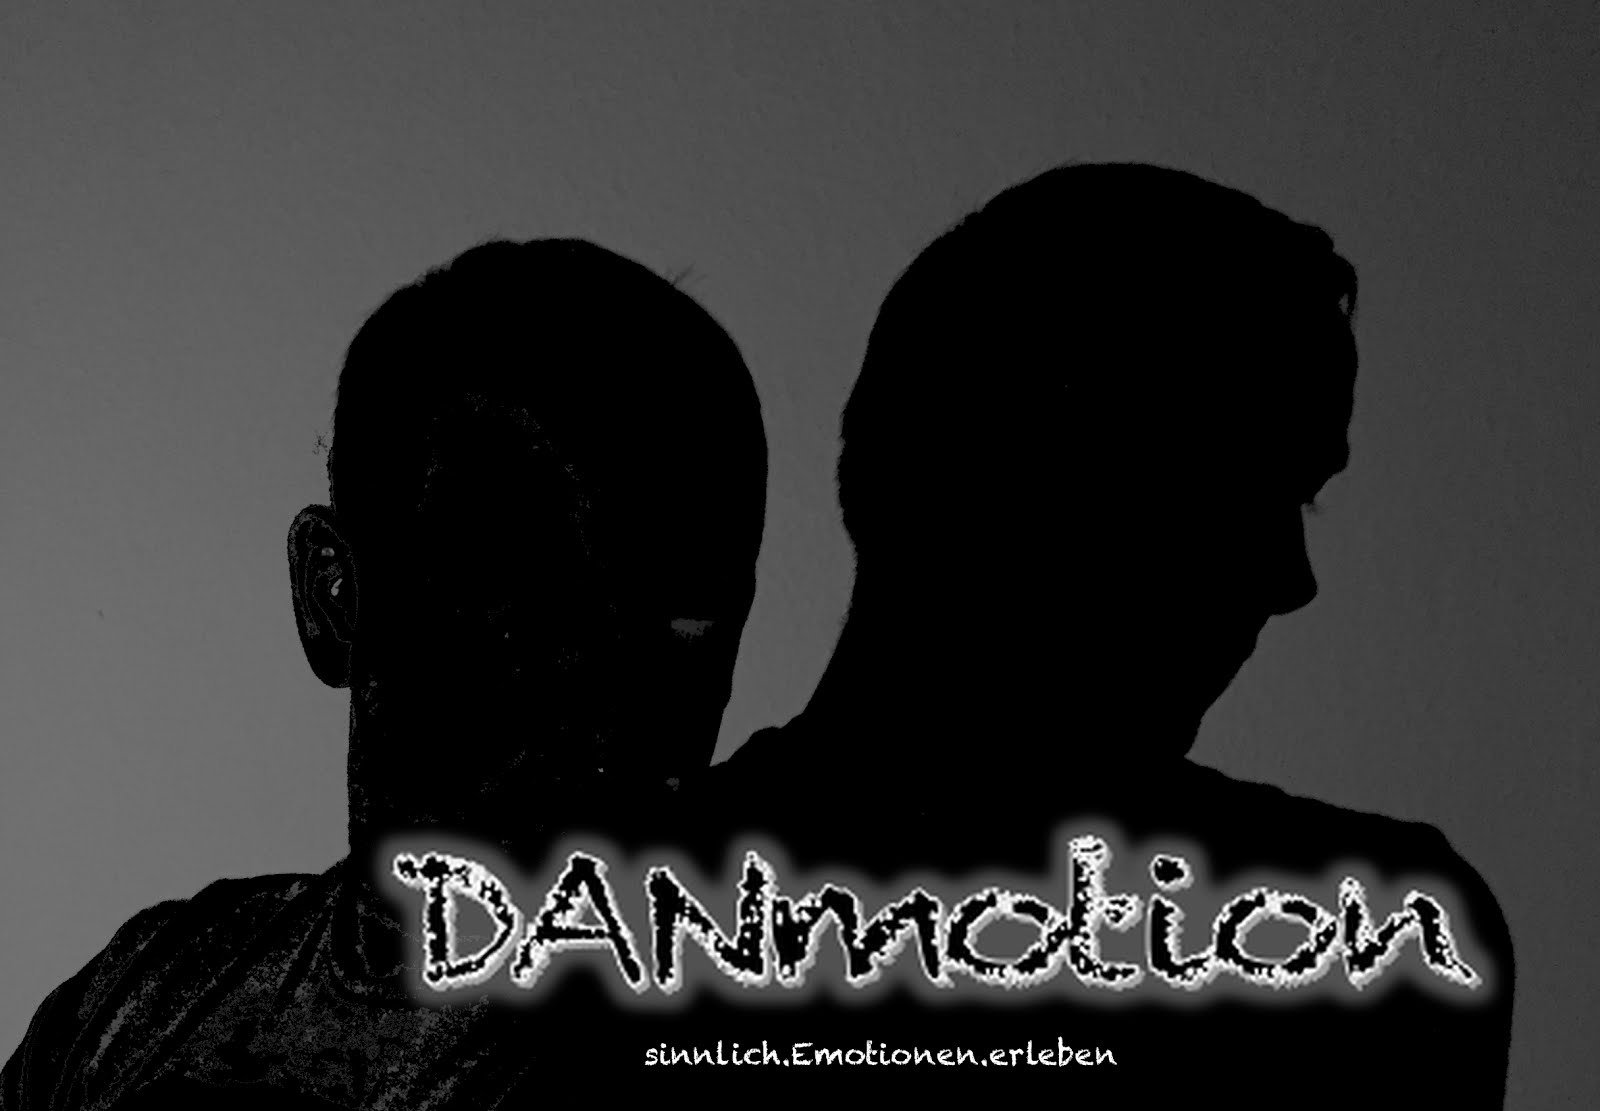 DANmotion